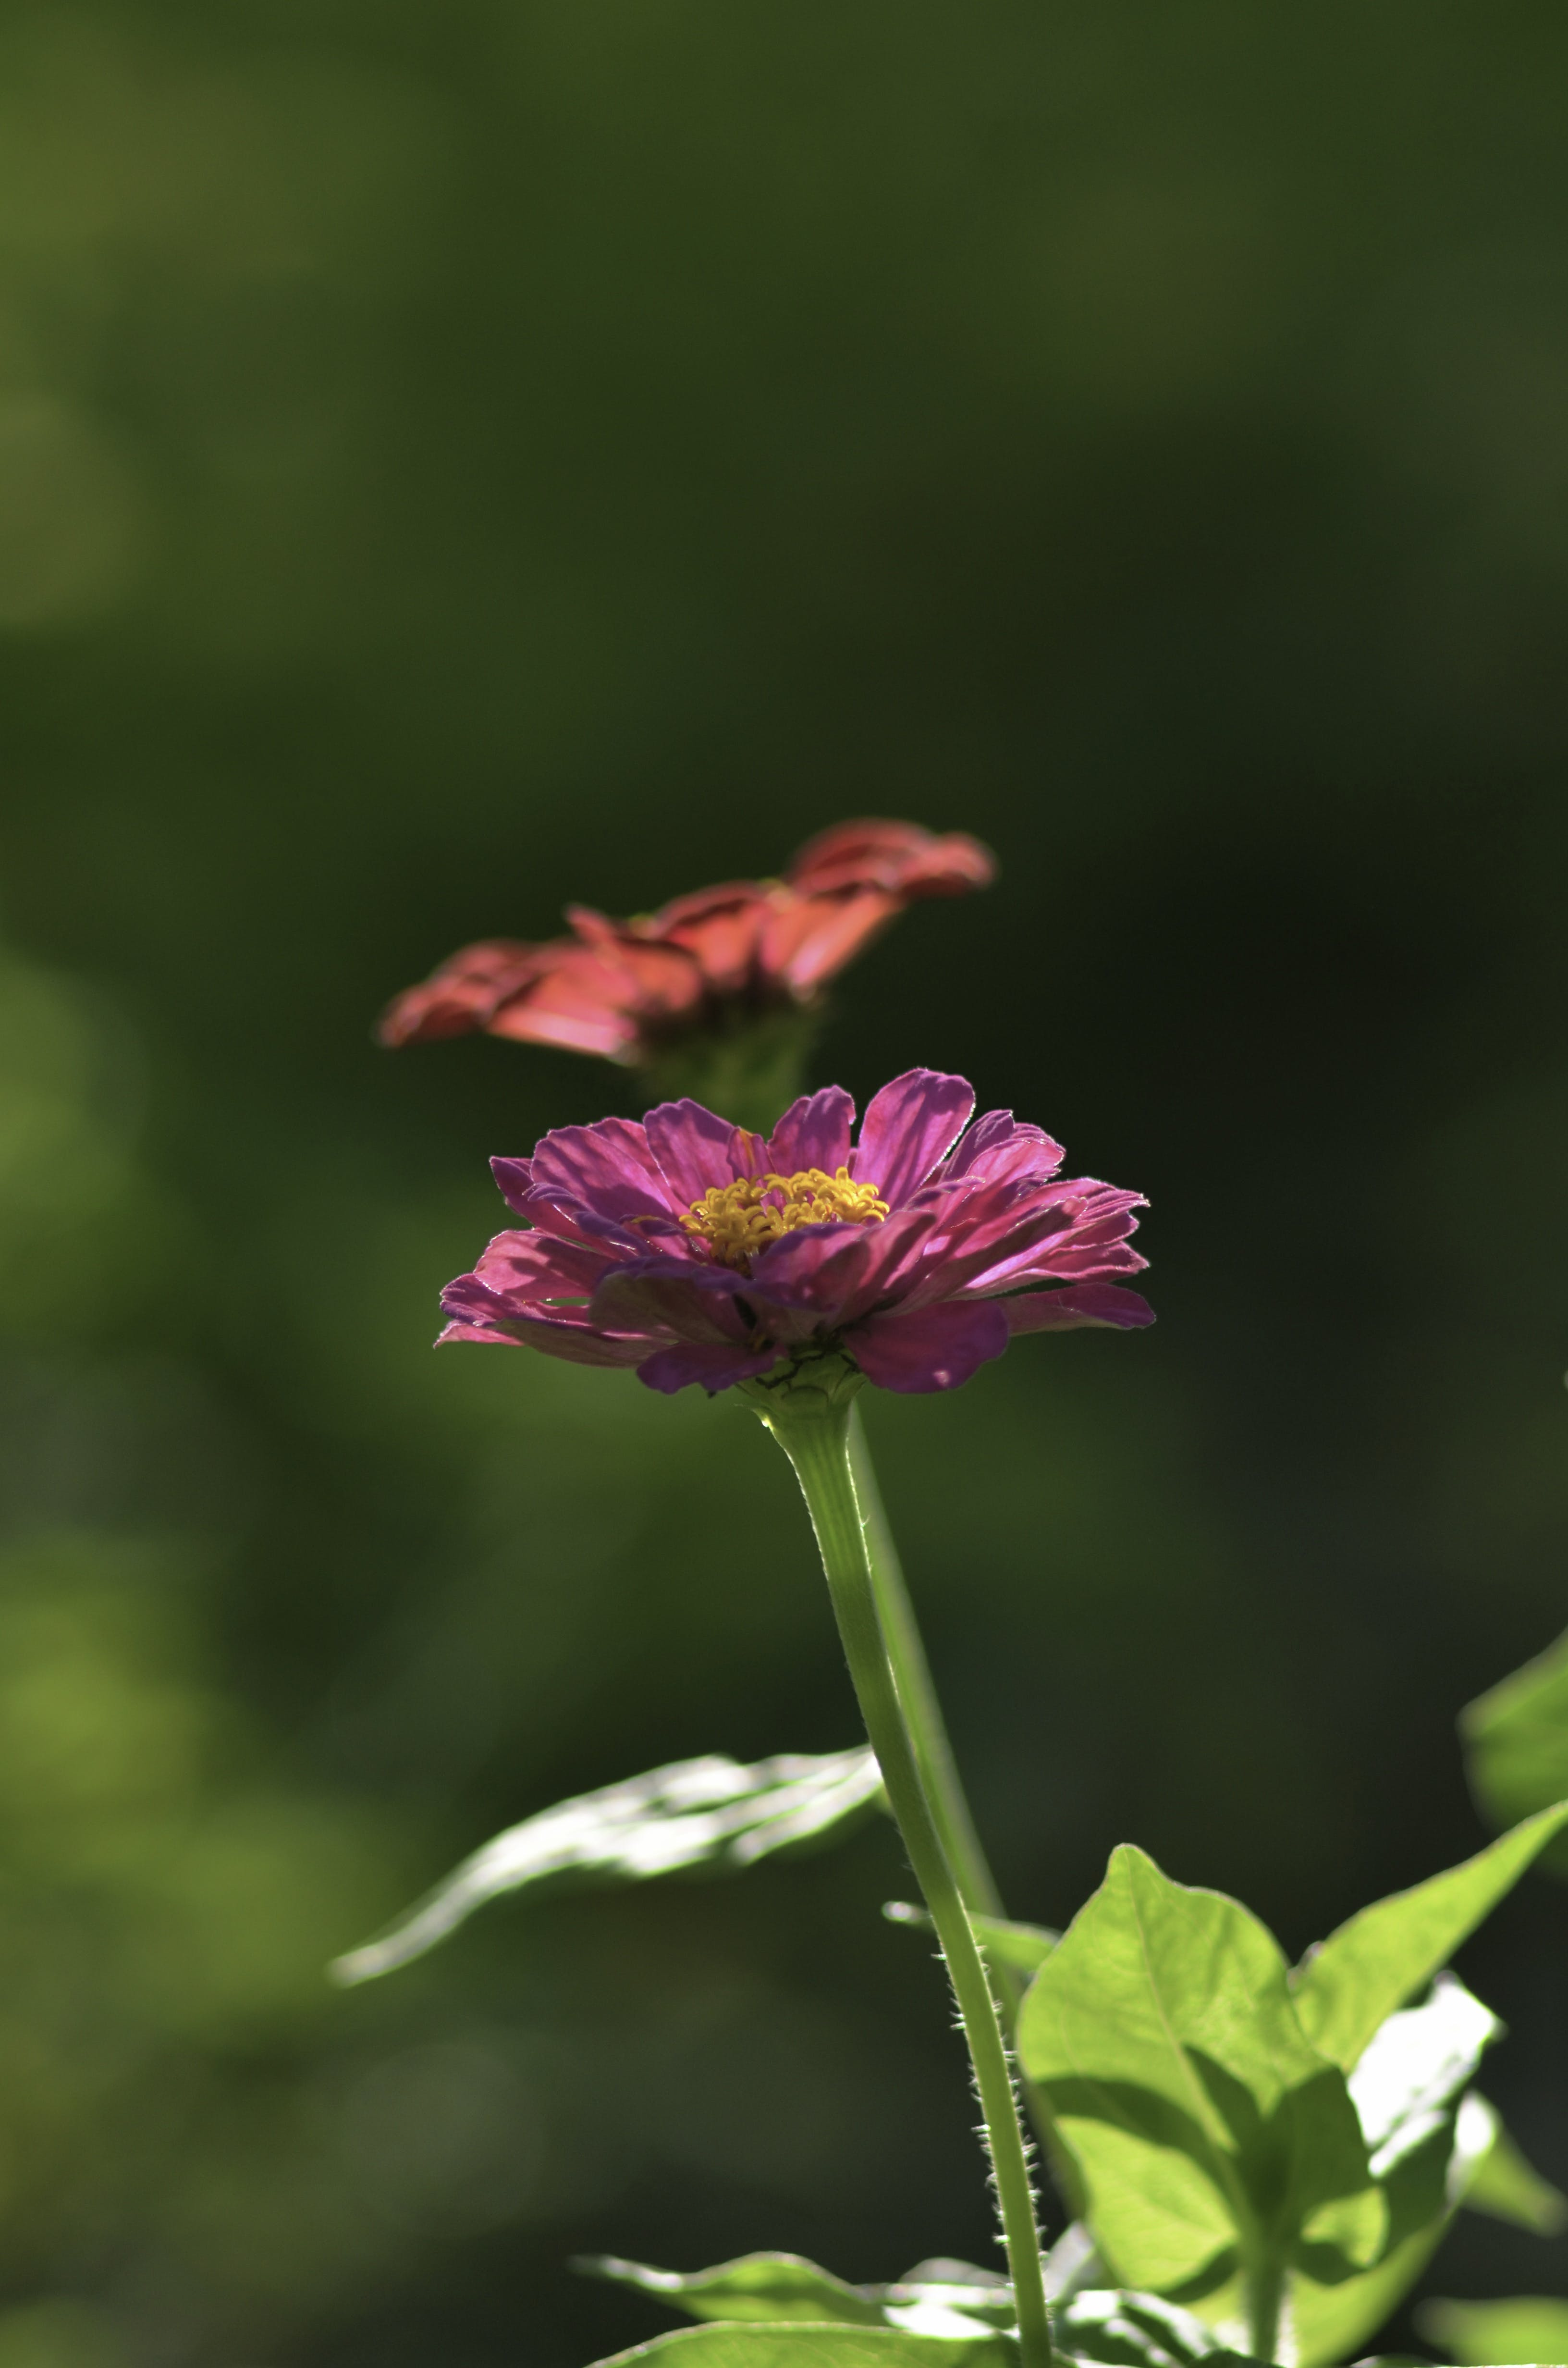 Close Up Photography of Purple Petaled Flower Near Orange Petaled Flower